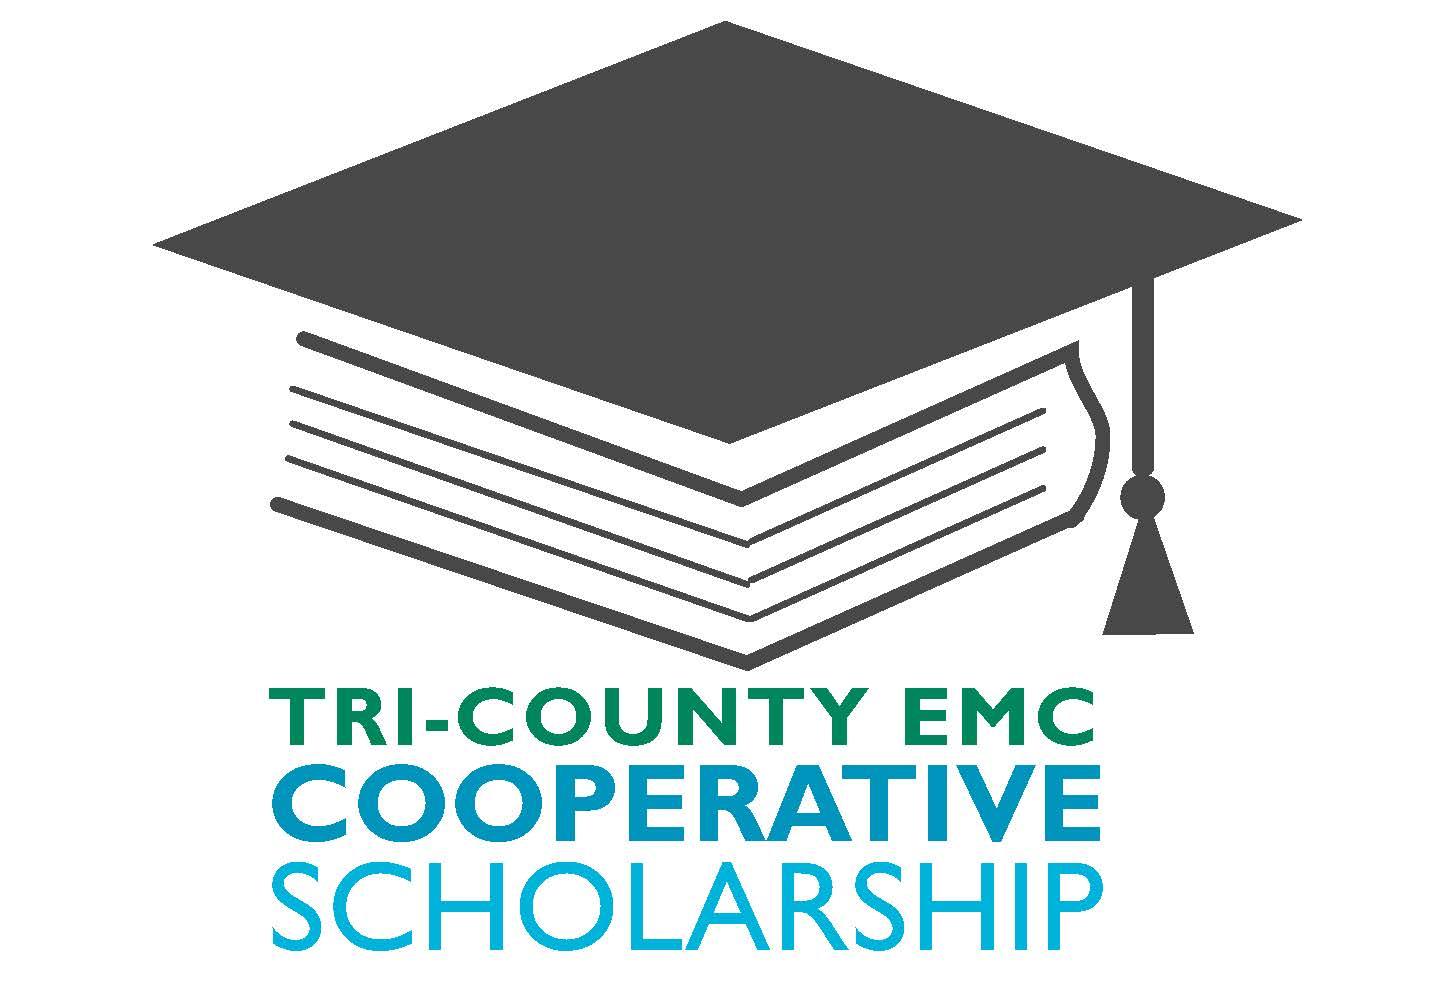 Cooperative Scholarship - Scholarships - Tri-County EMC